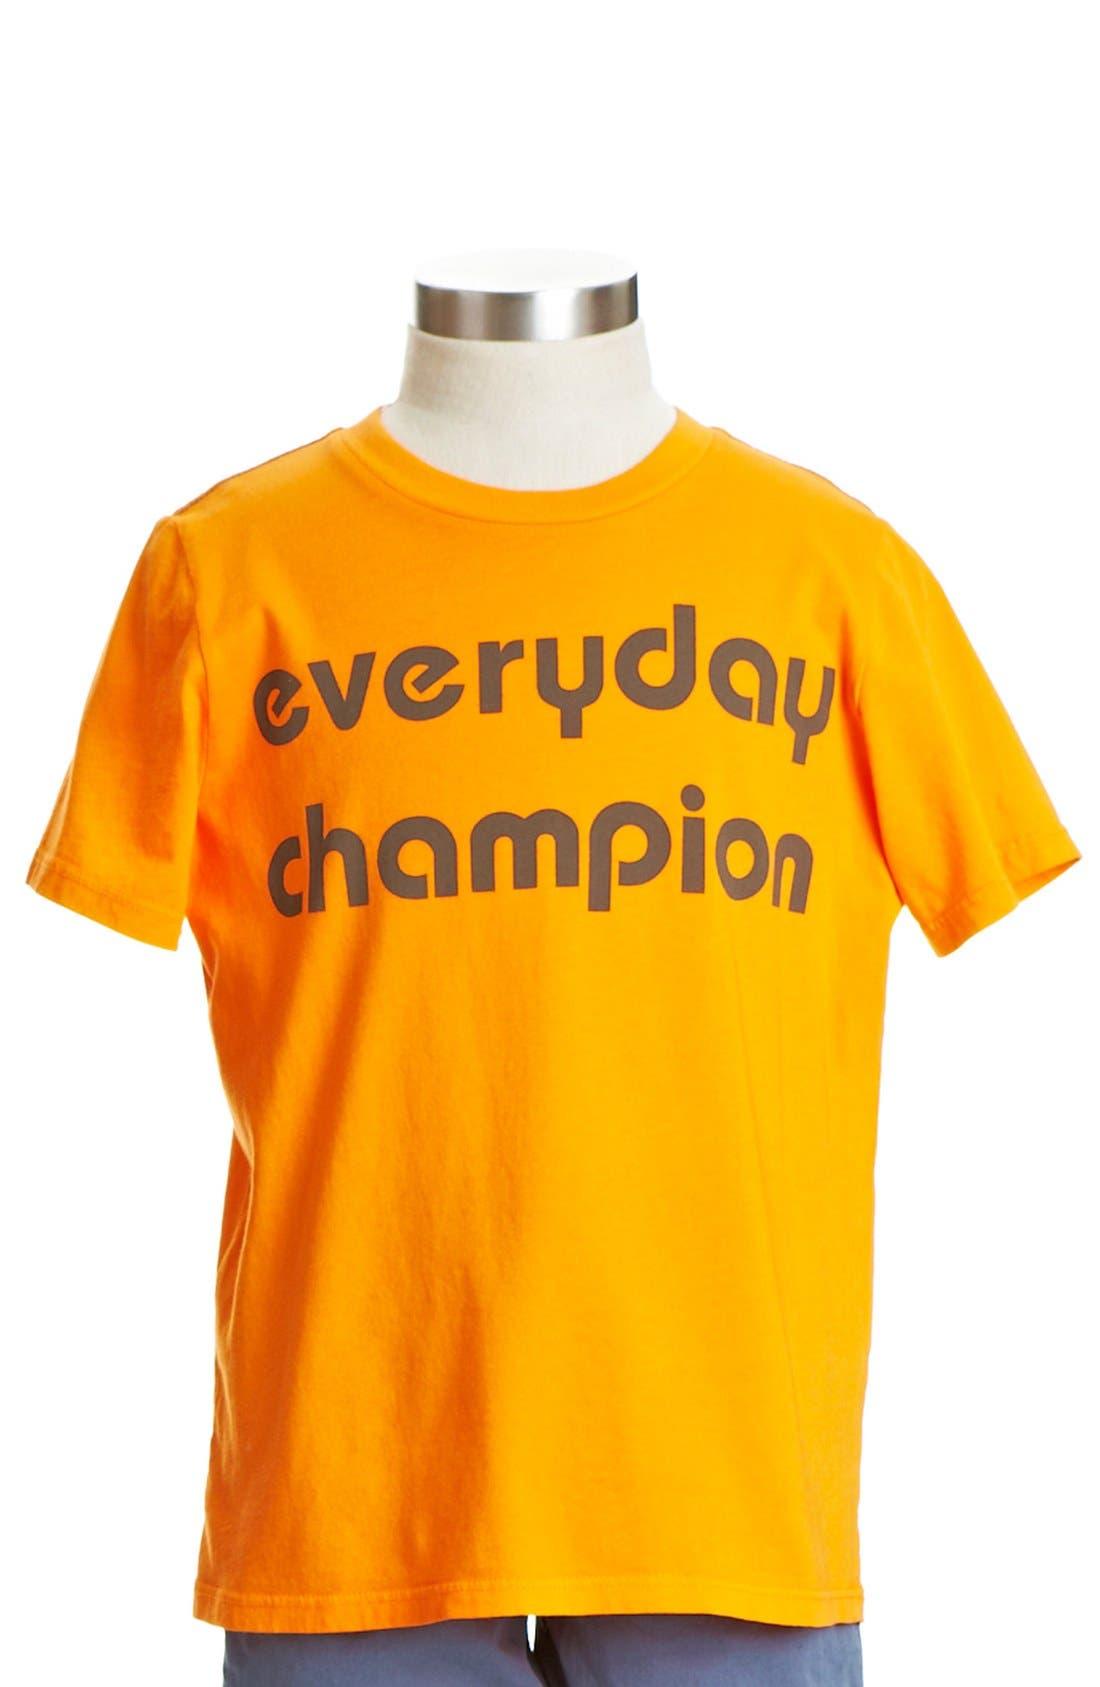 Alternate Image 1 Selected - Peek 'Everyday Champion' T-Shirt (Toddler Boys, Little Boys & Big Boys)